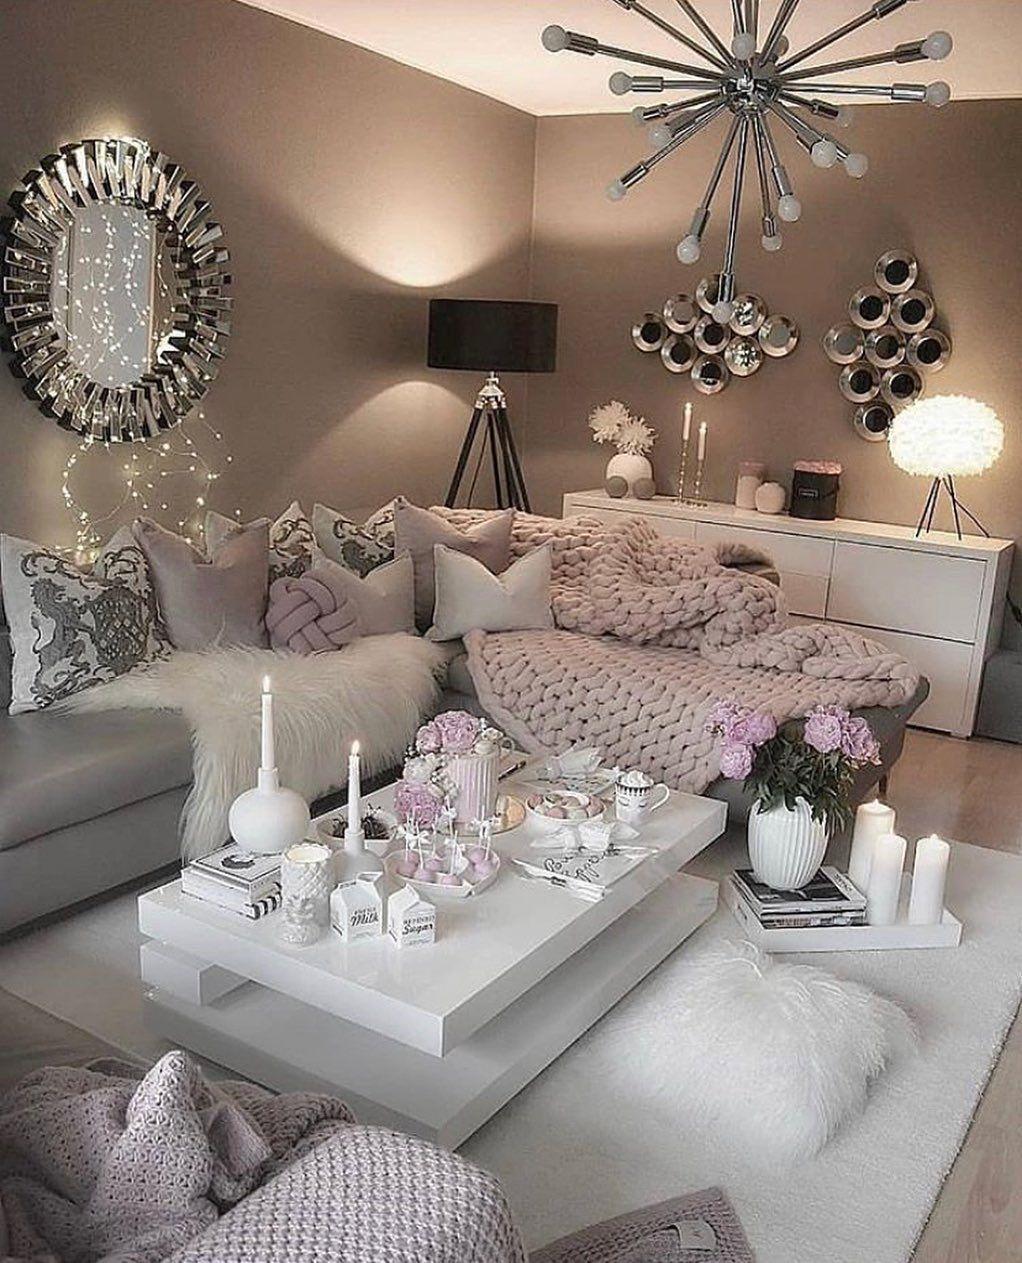 Home Design Ideas Instagram: Simone On Instagram : Goodnight Insta Stay